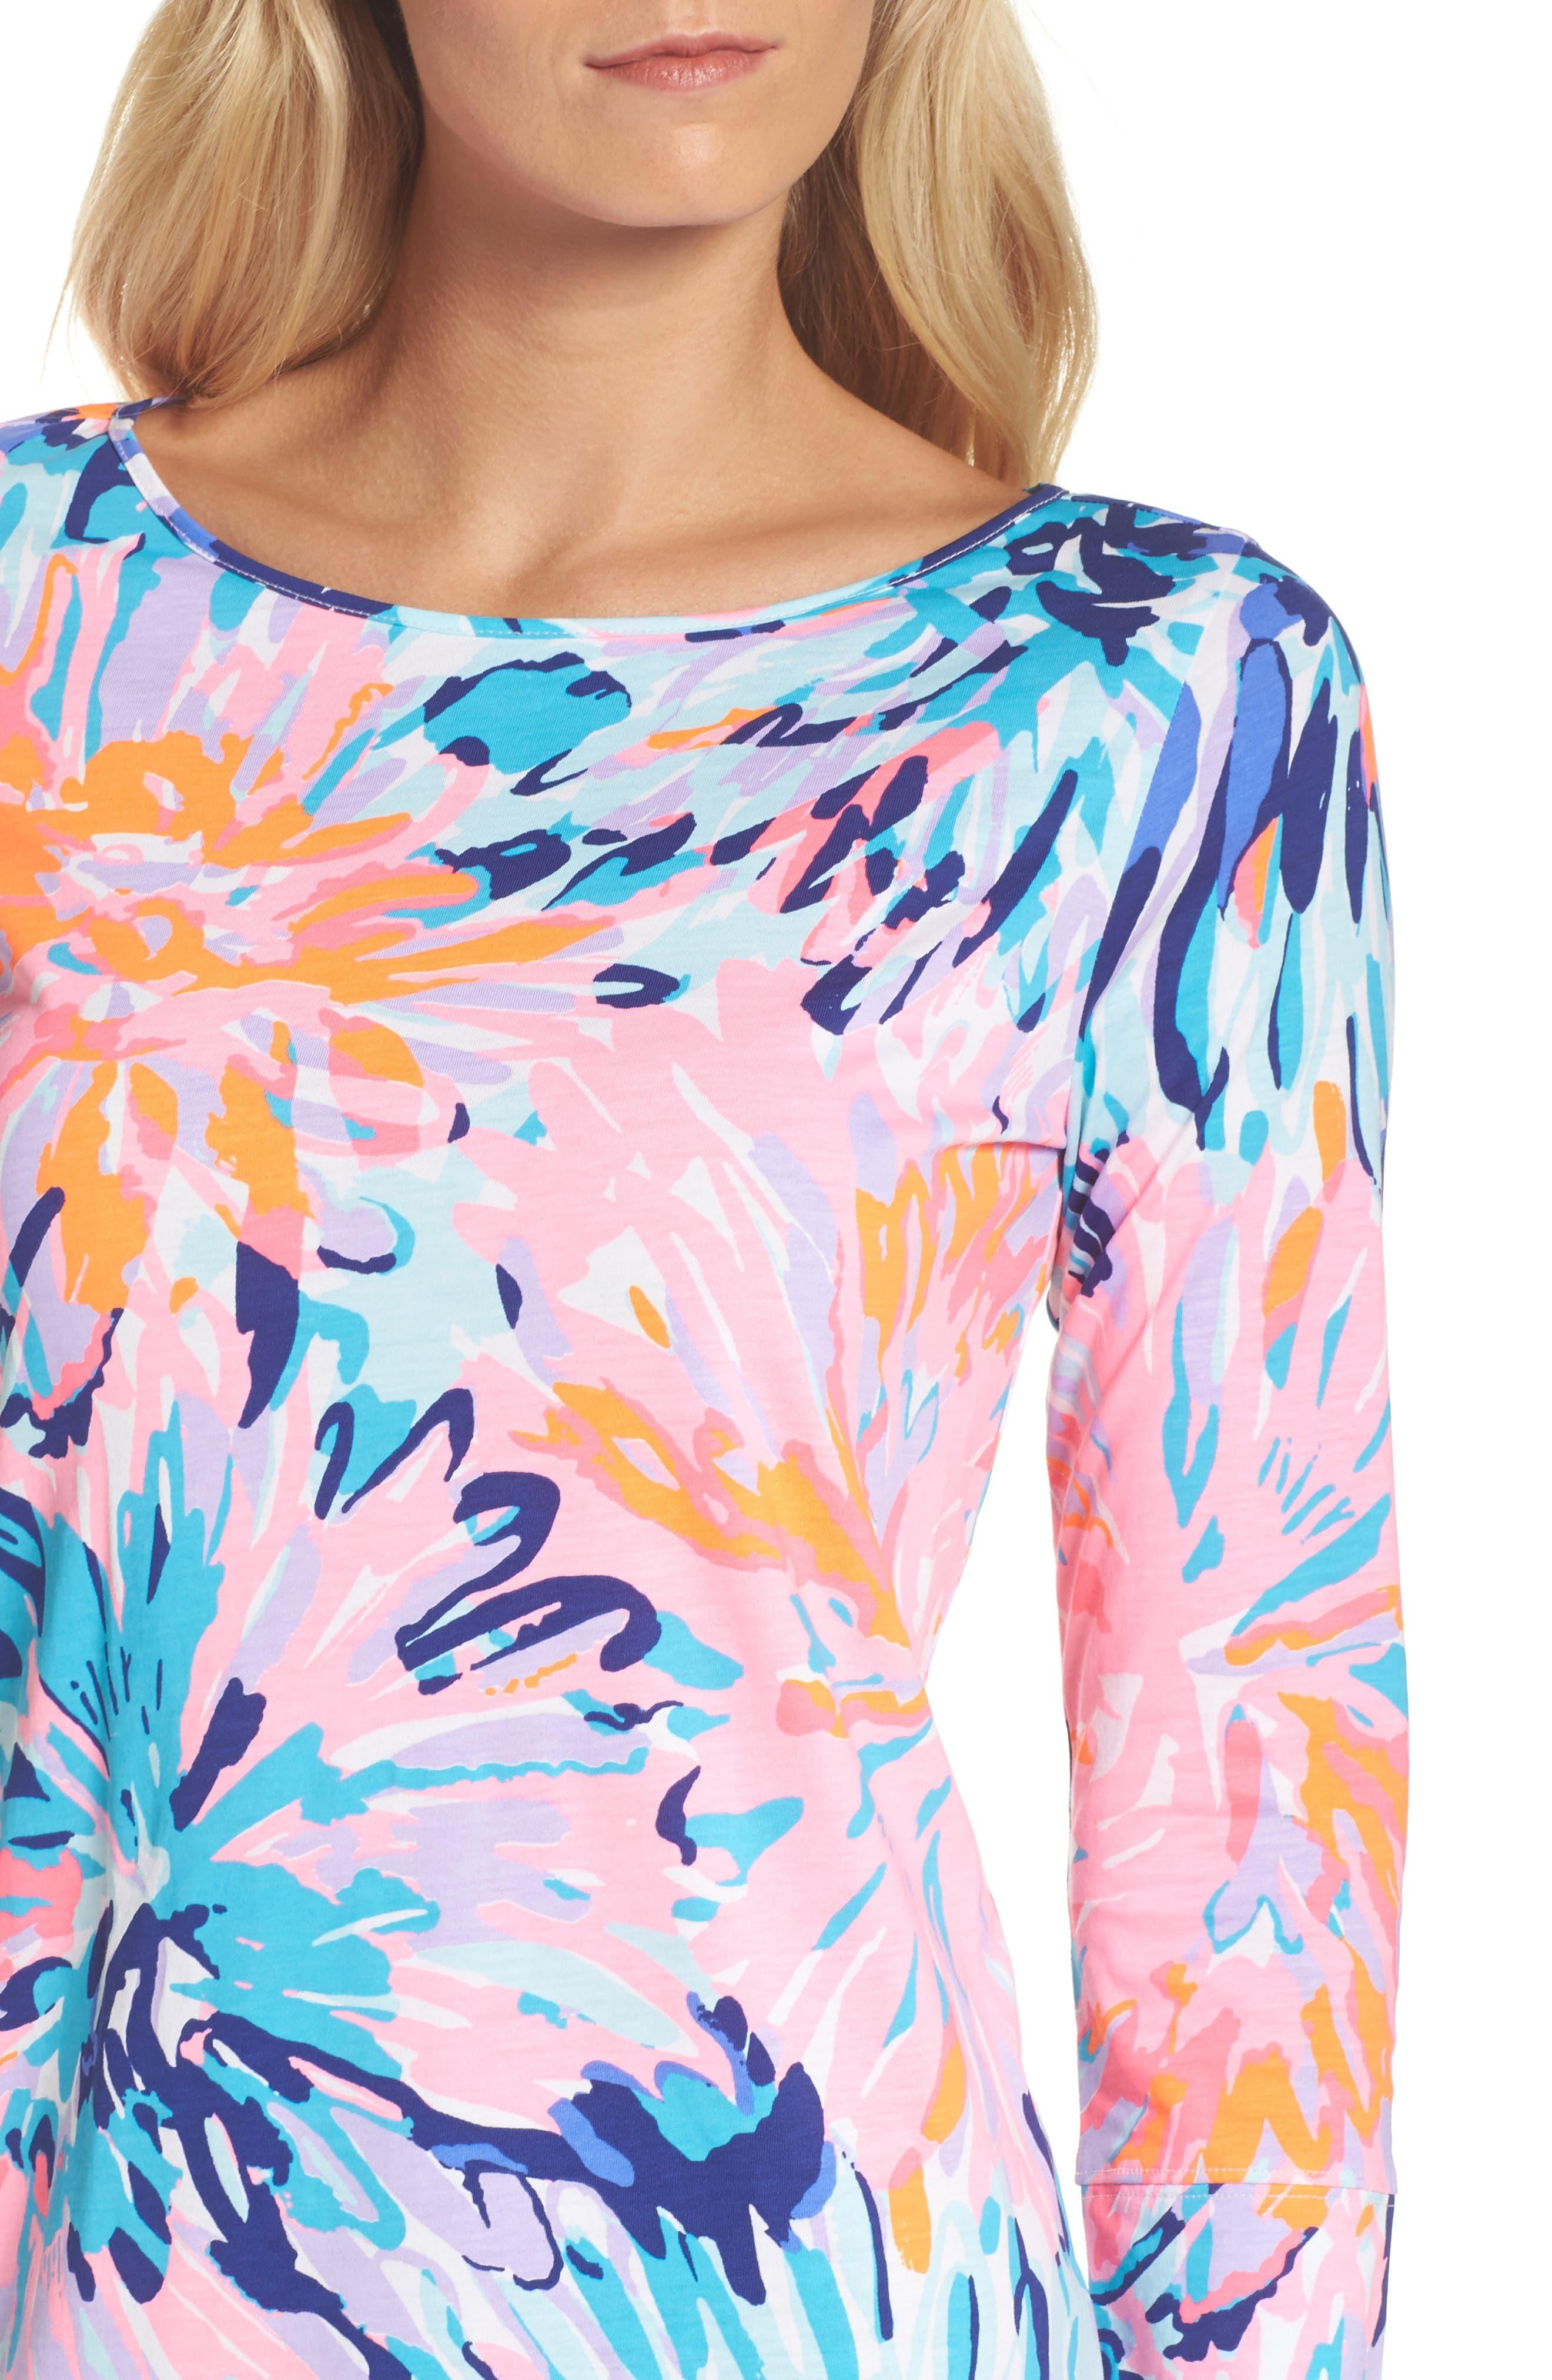 Marlowe T-Shirt Dress,                             Alternate thumbnail 4, color,                             651